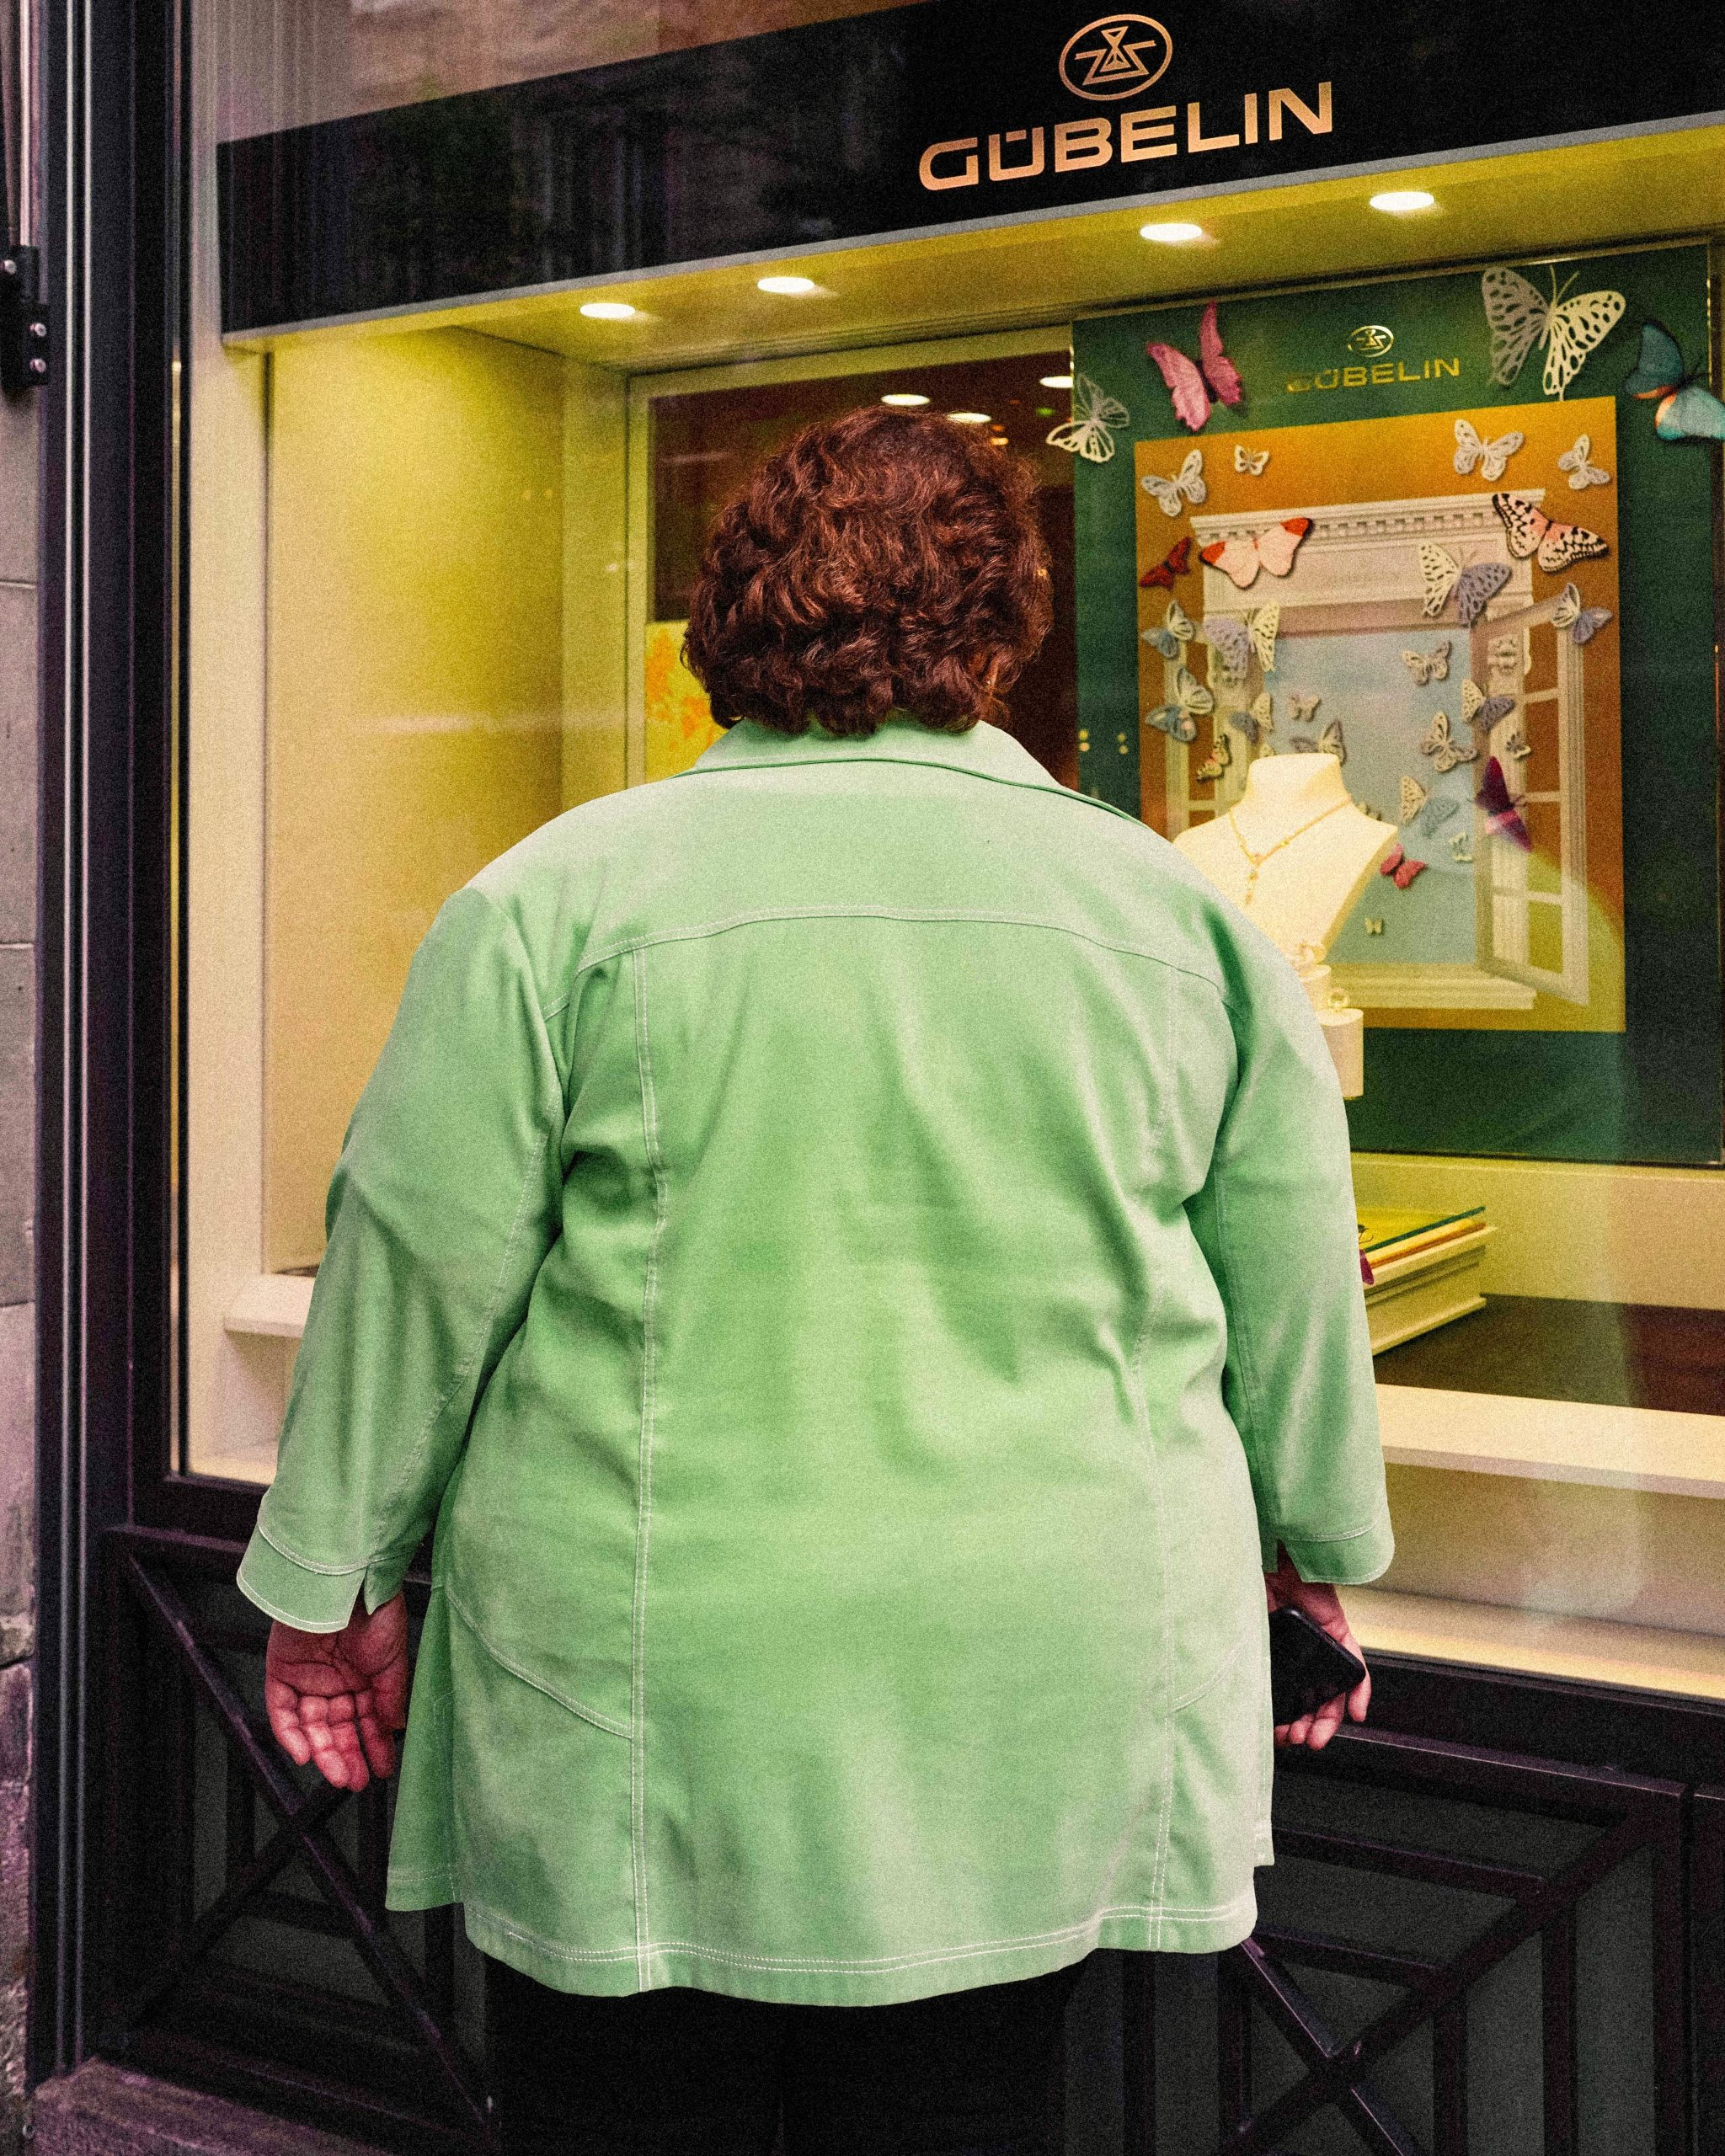 Worldwide obesity has nearly tripled since 1975